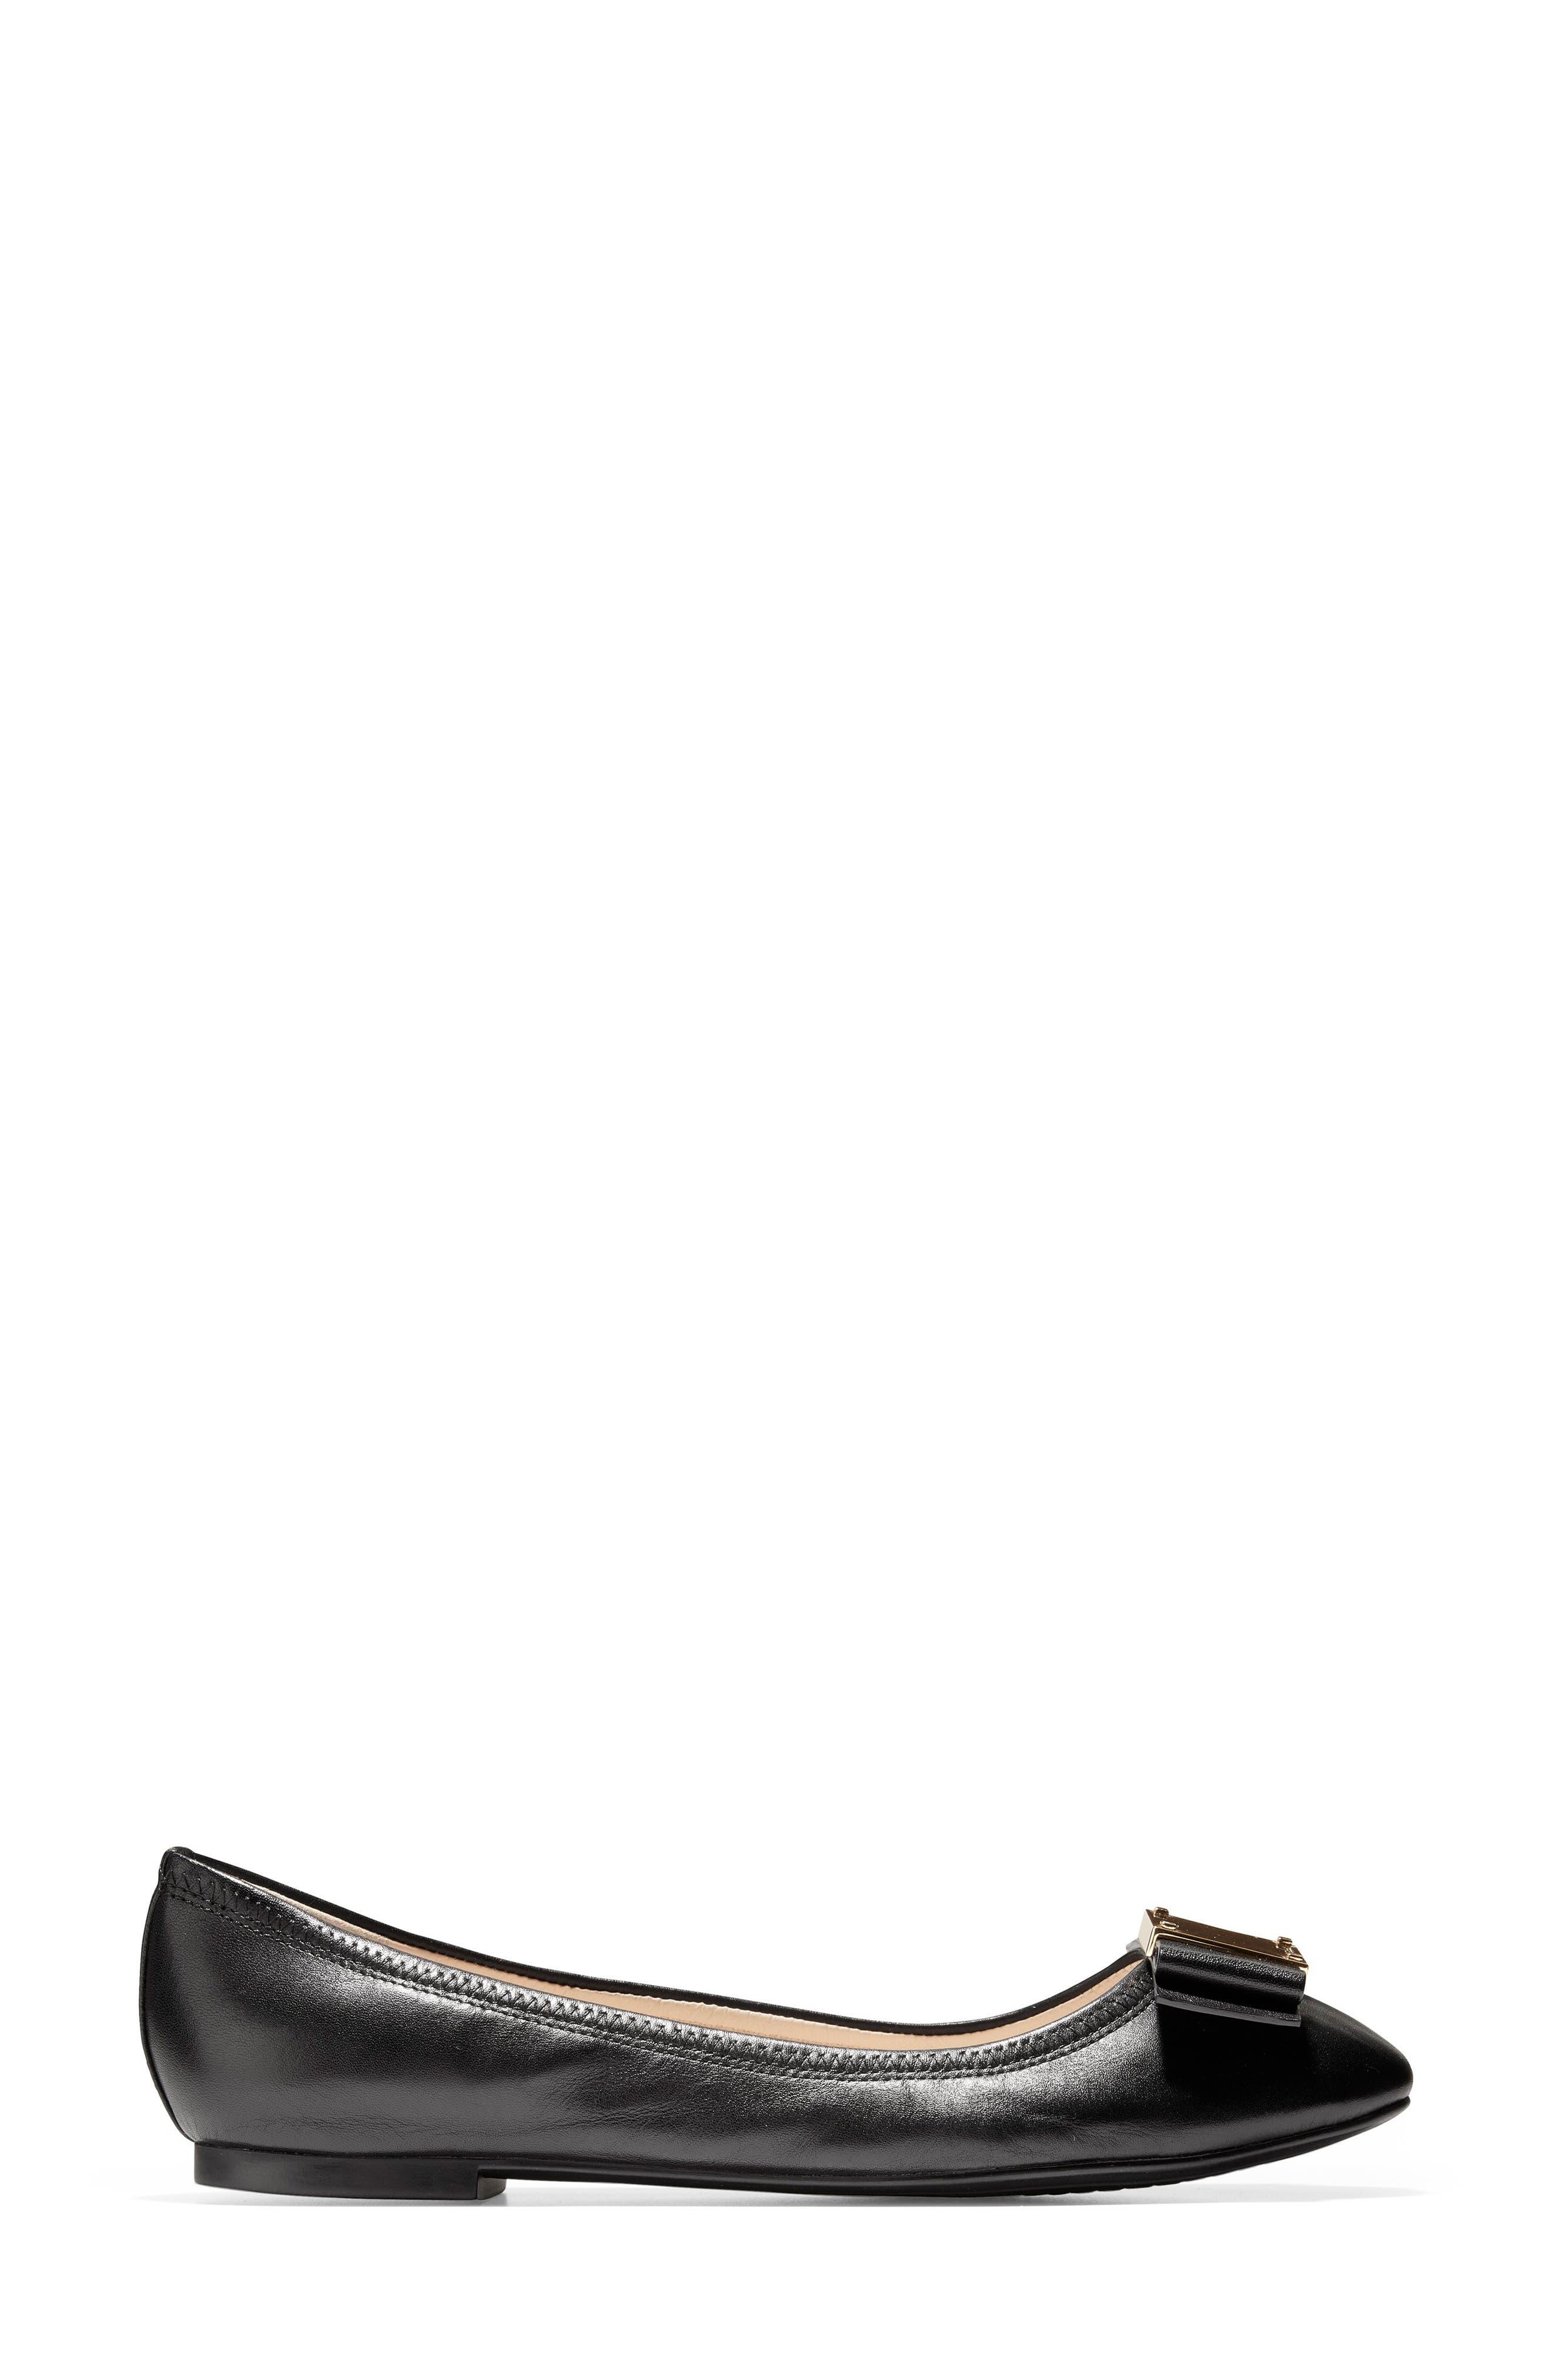 Tali Modern Bow Ballet Flat,                             Alternate thumbnail 3, color,                             BLACK LEATHER